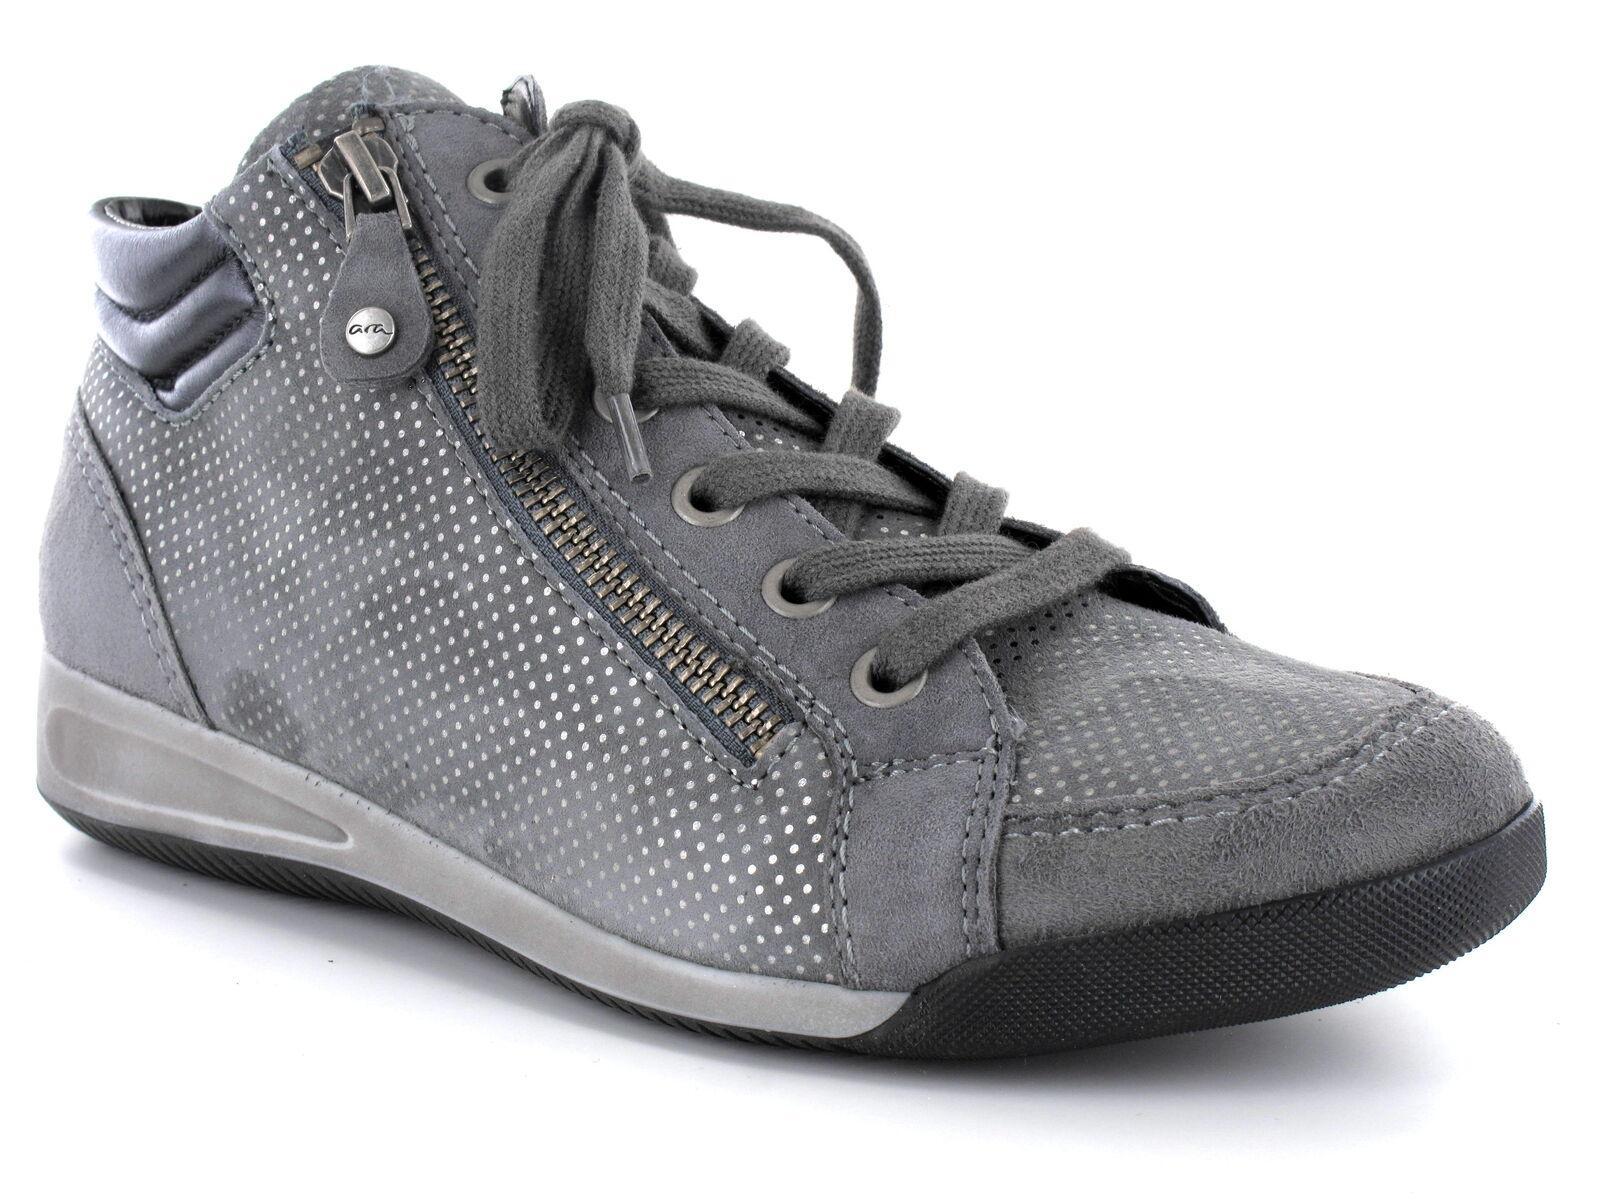 44410 Stiefel 12 Grau Weite 25 Stiefely Chaussures Ara Tennis Rom de xerodCB